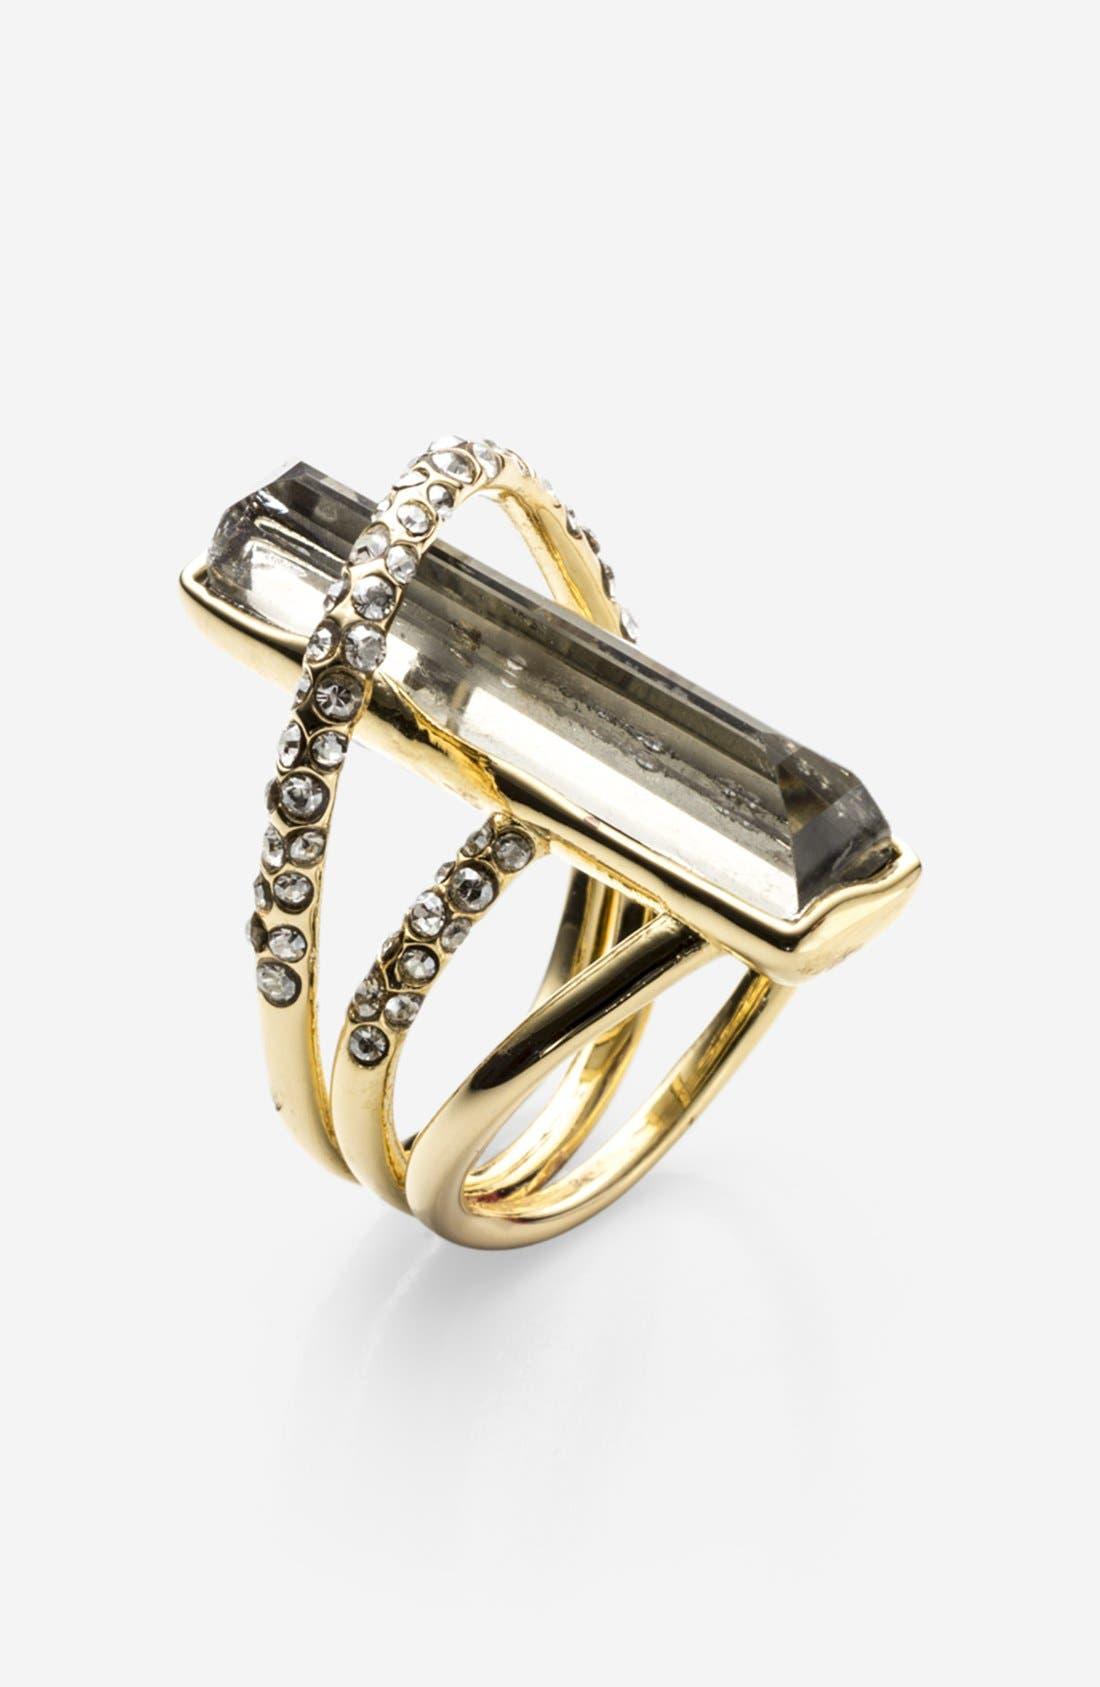 Alternate Image 1 Selected - Alexis Bittar 'Miss Havisham' Open Doublet Ring